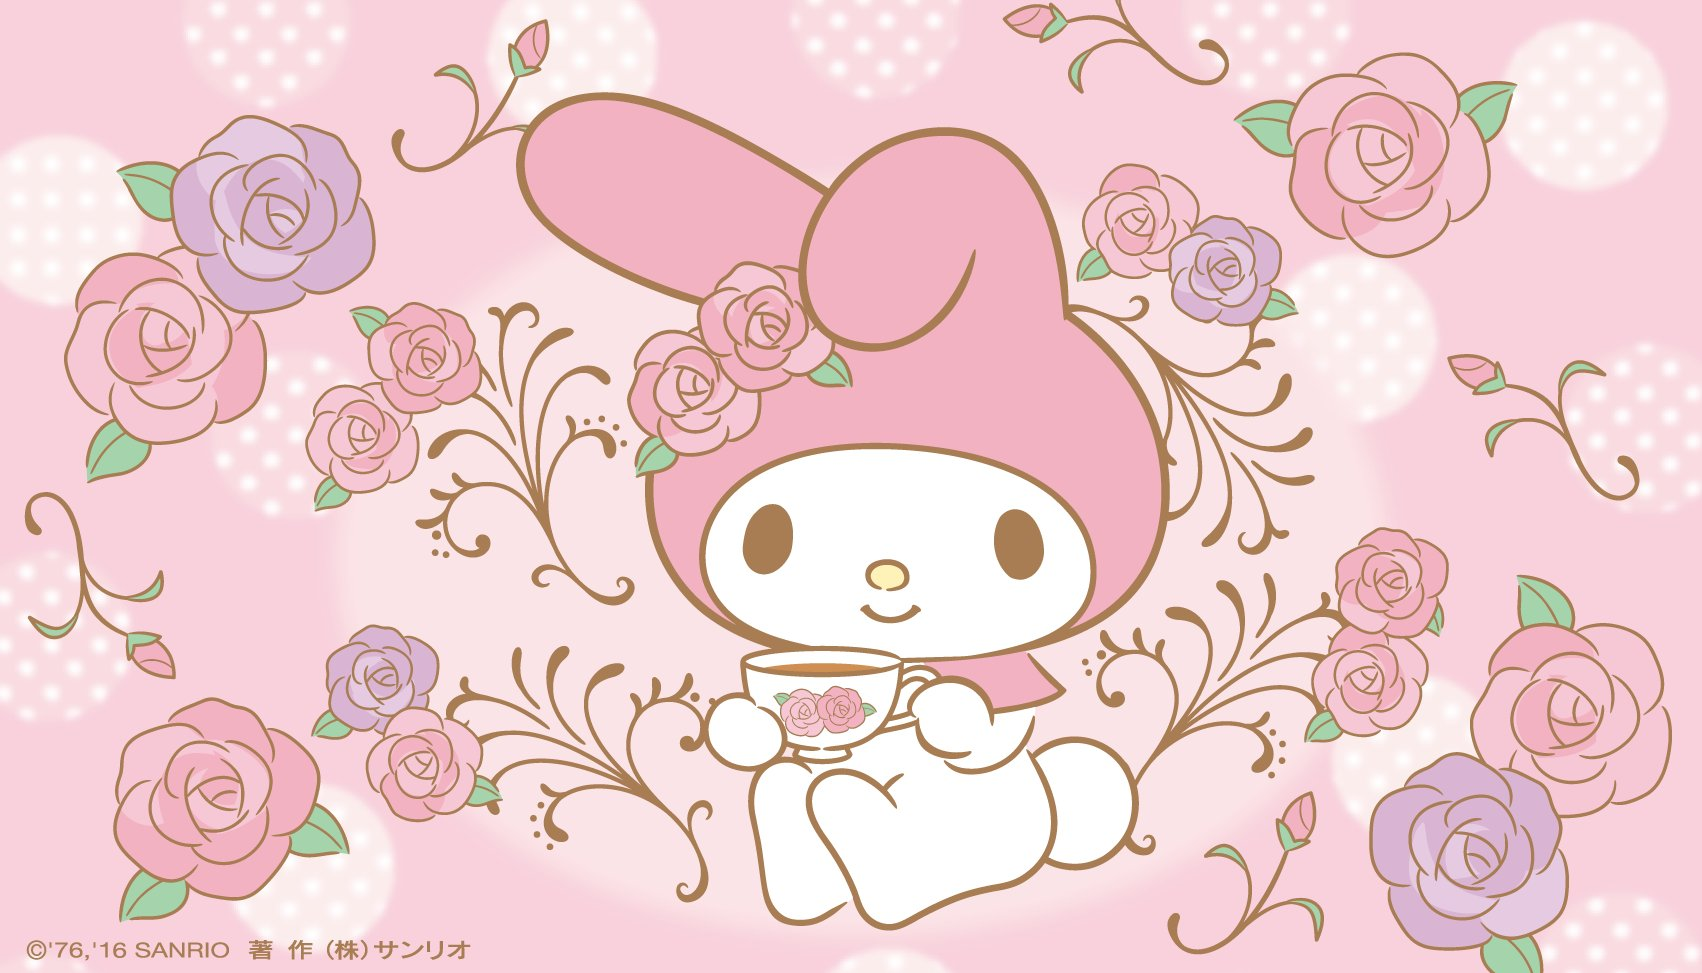 Hd Live Wallpaper For Tablet My Melody Wallpaper Wp5801981 Downloadwallpaper Org